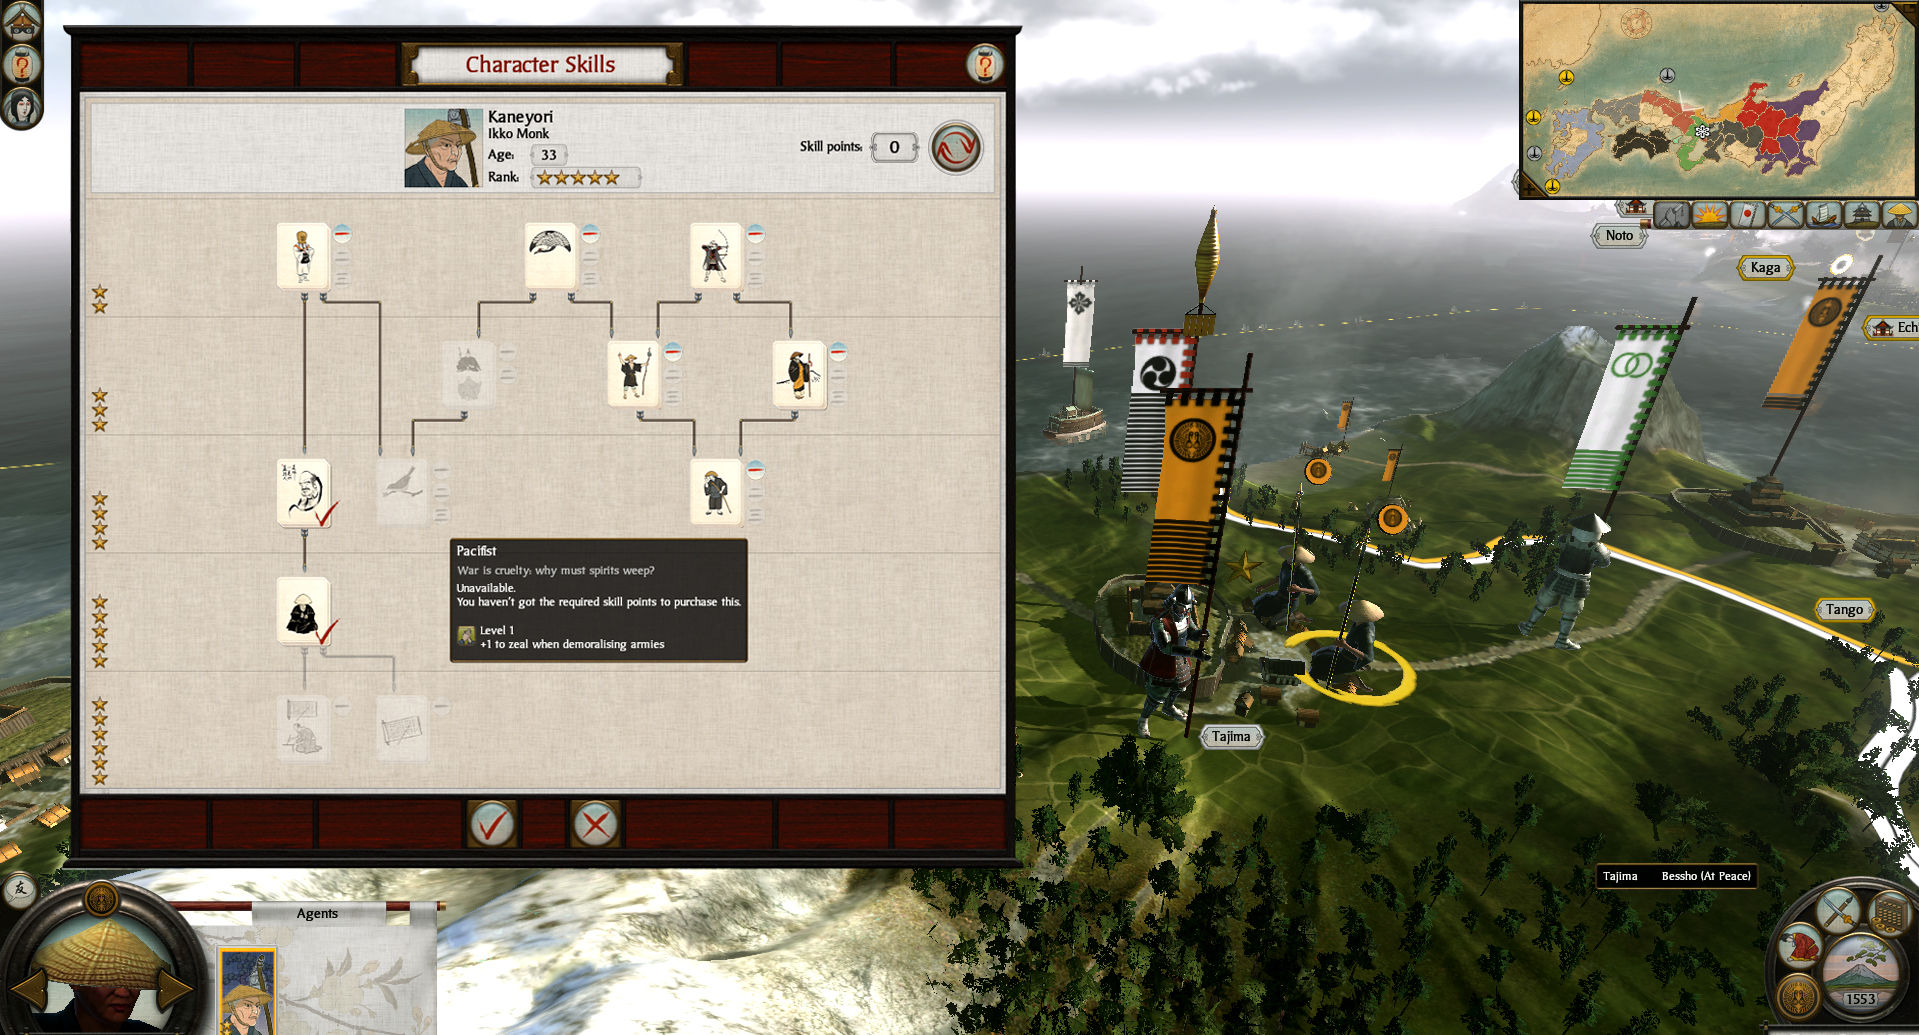 Total war: shogun 2 - the ikko ikki clan pack download for macos